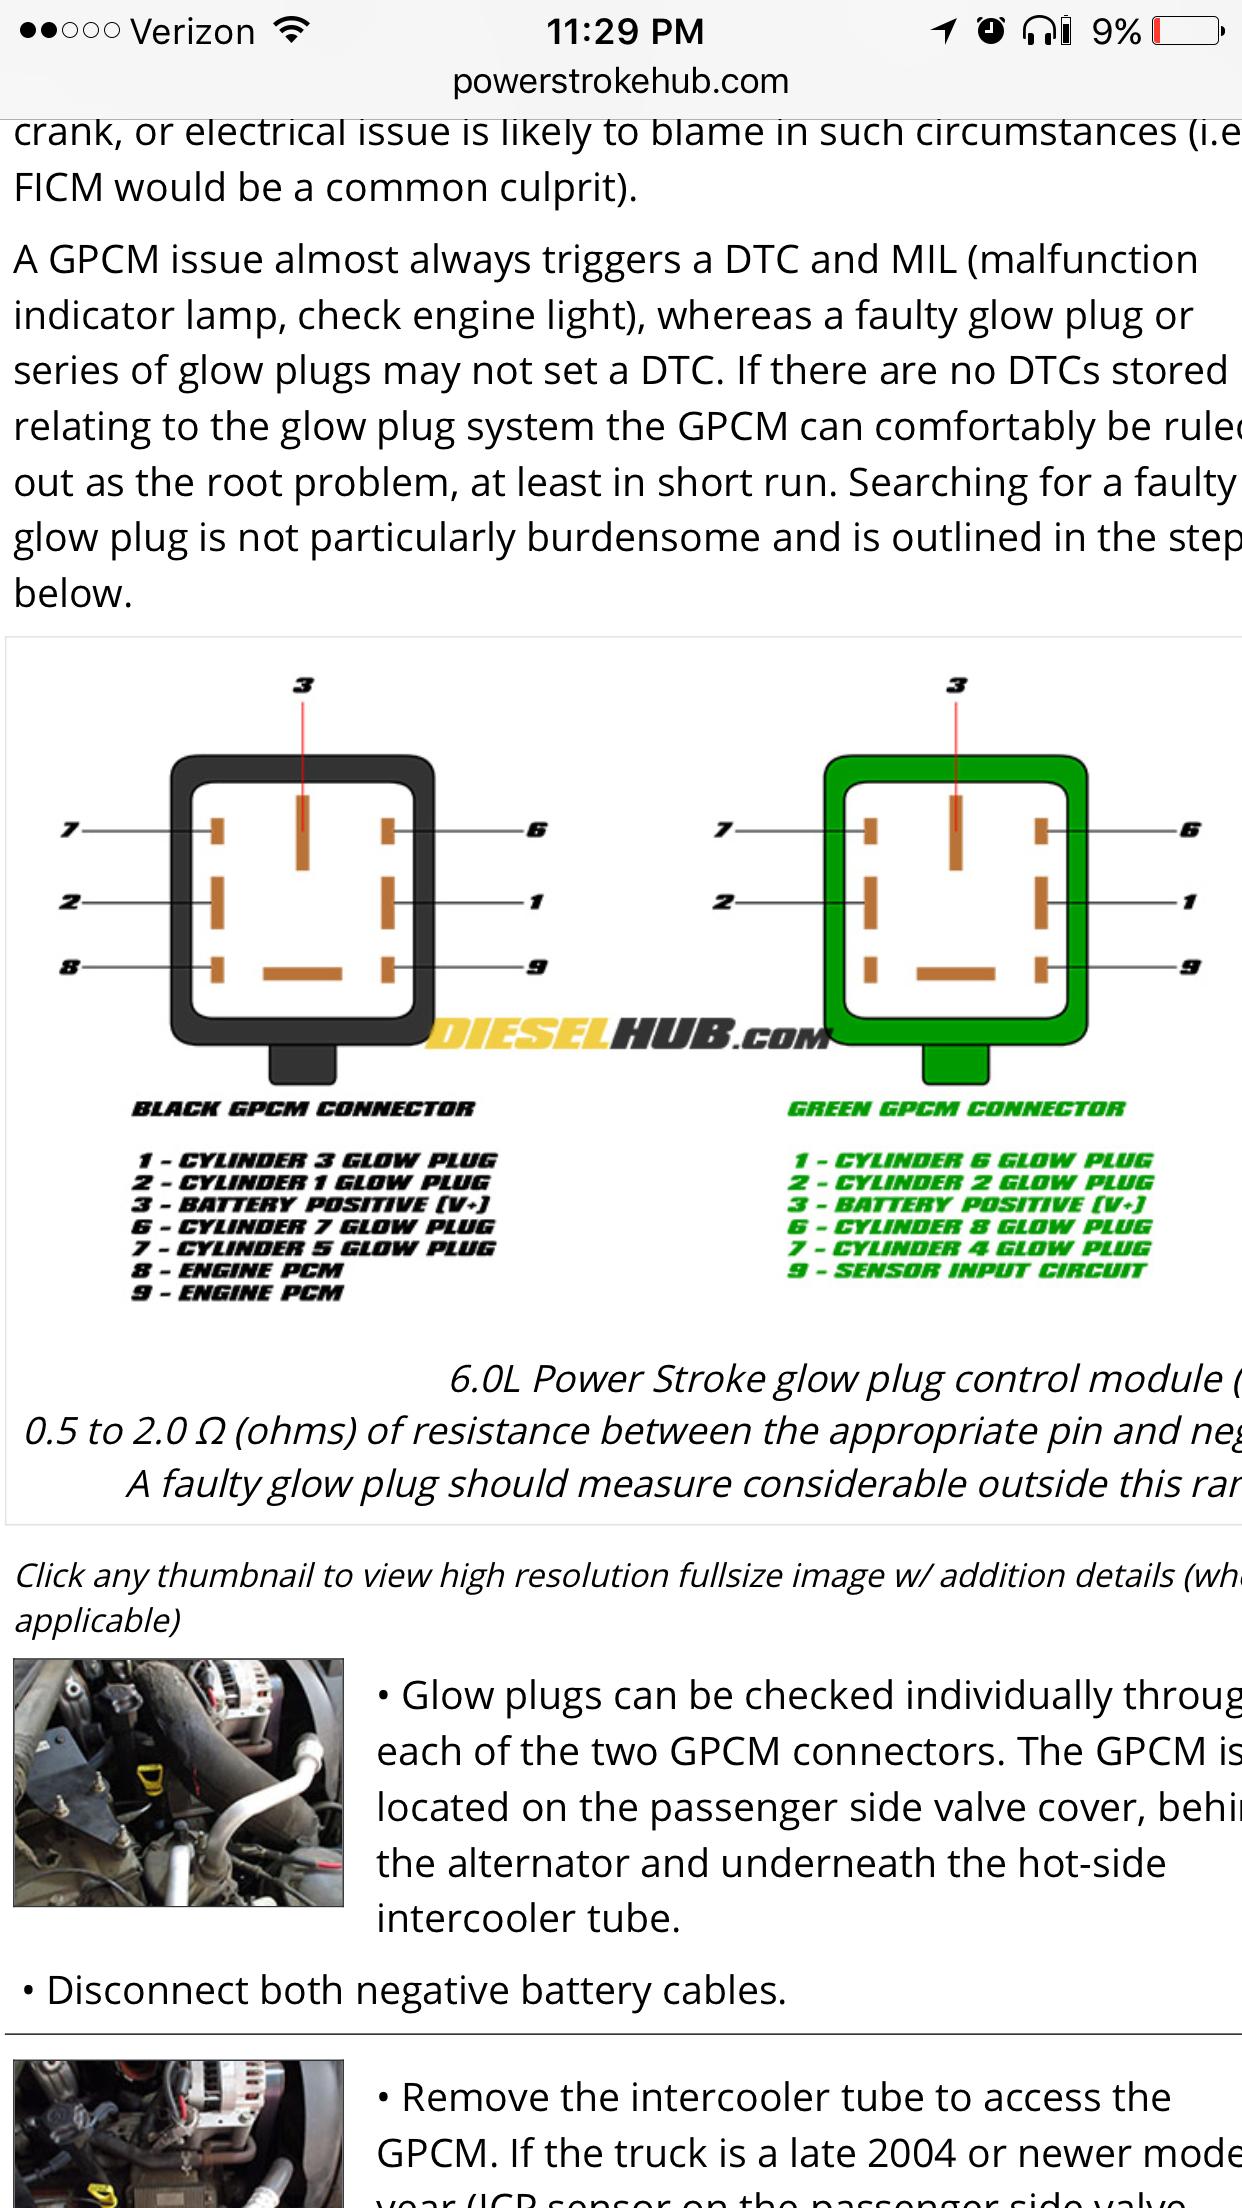 Ford 7 3 Glow Plug Relay Wiring Diagram On 6 9 Glow Plug Wiring